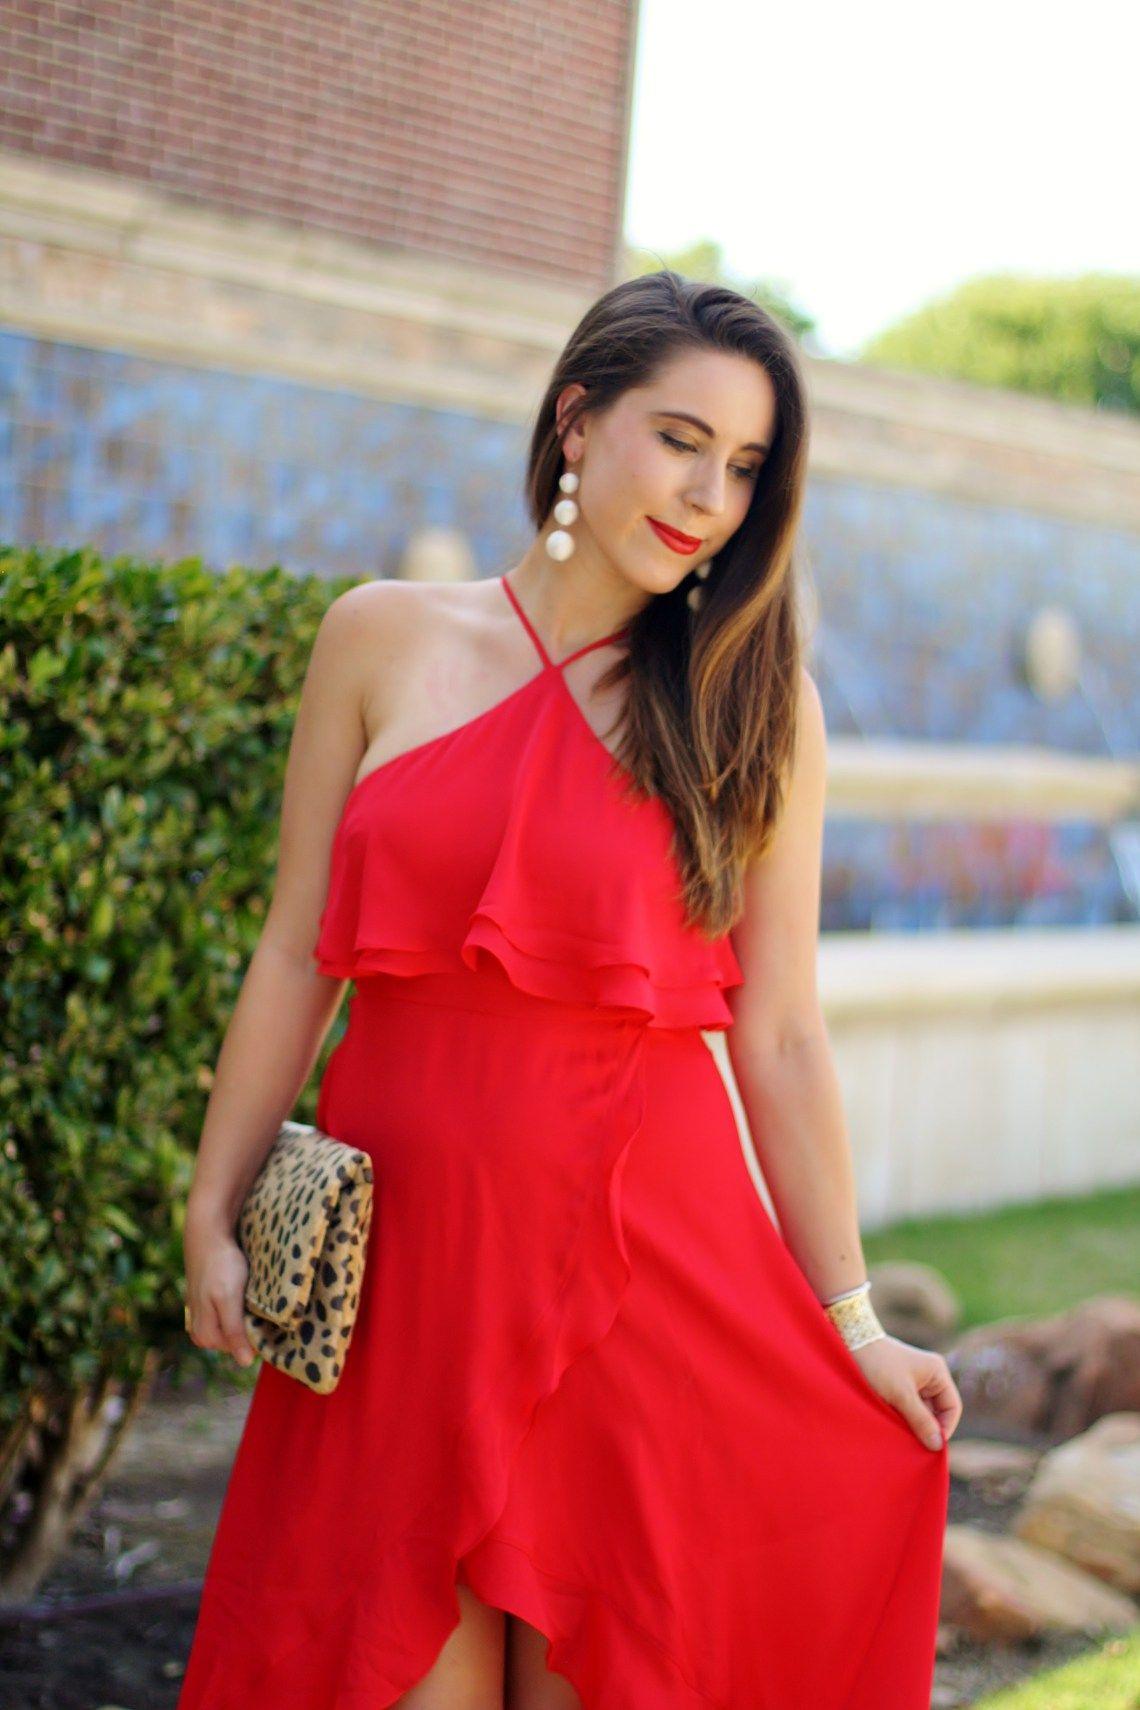 bca84c9f831 Red Emoji Dress + Having Fun With Your Style. »